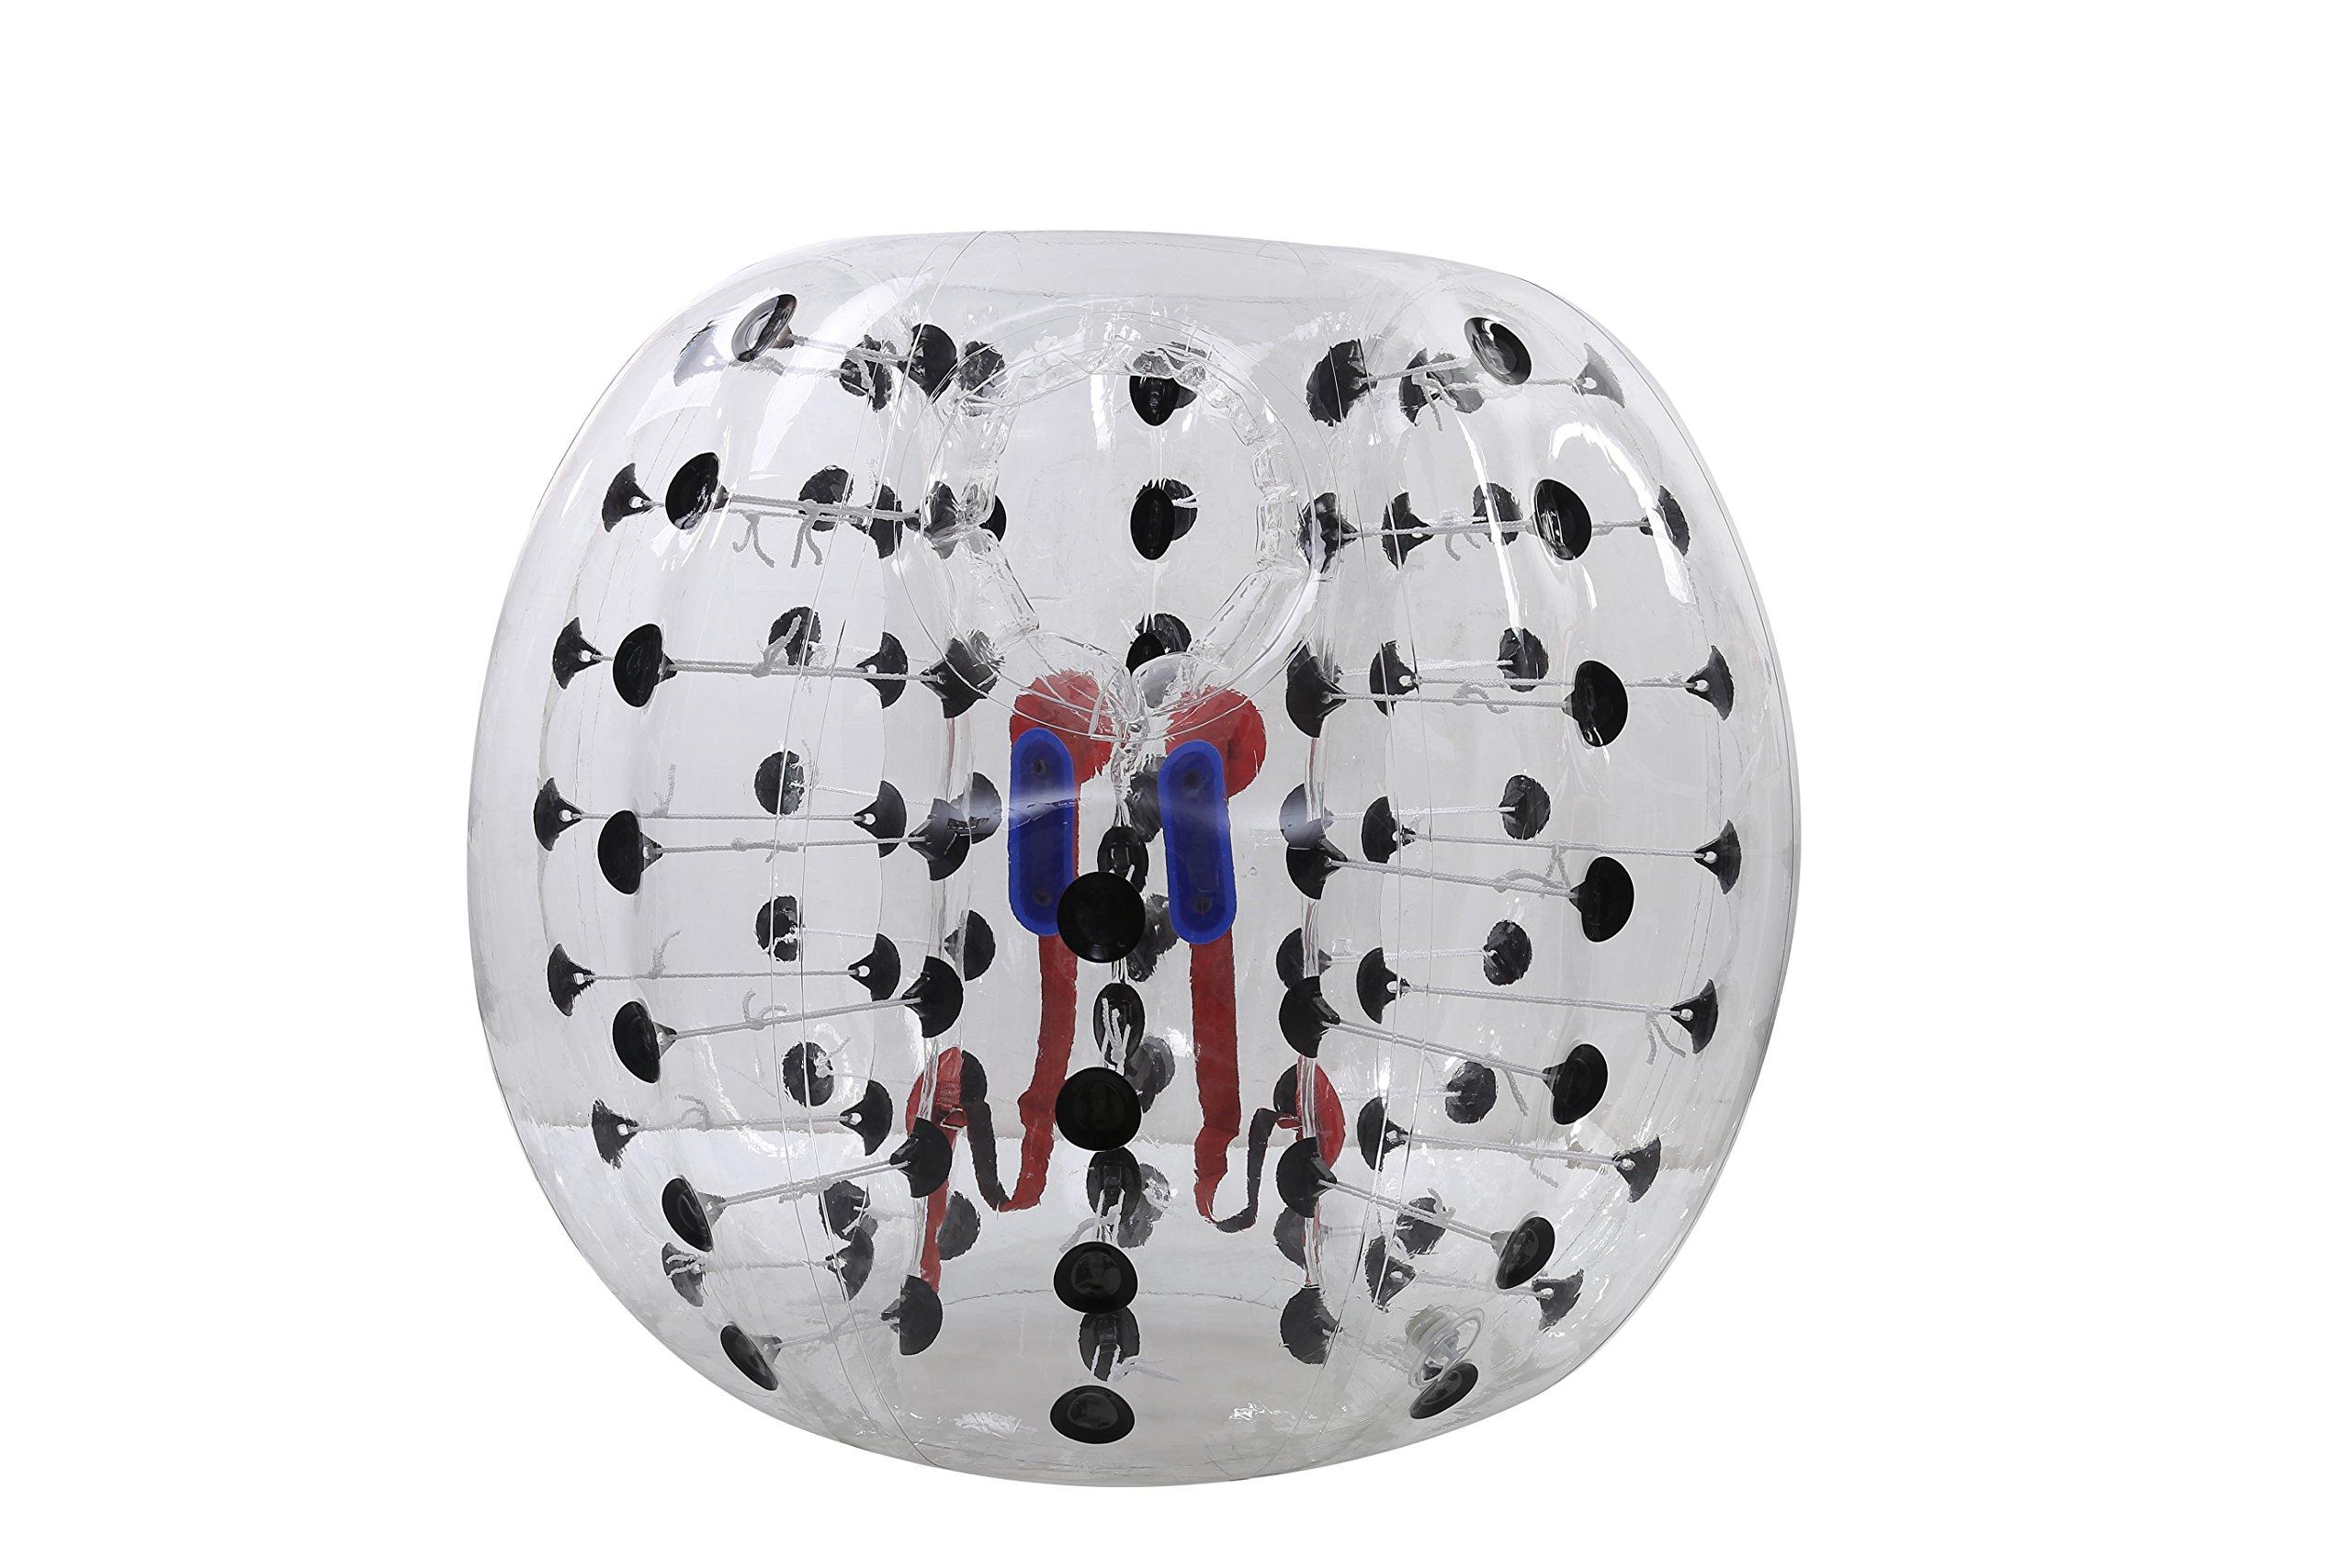 Bubble Soccer Balls Dia 5' (1.5m) Human Hamster Ball, Bubble Football,Bumper Ball, Zorbing Ball, Knocker Ball, smash ball stress ball Loopy Ball ( New Black Dot) by Garybank (Image #2)